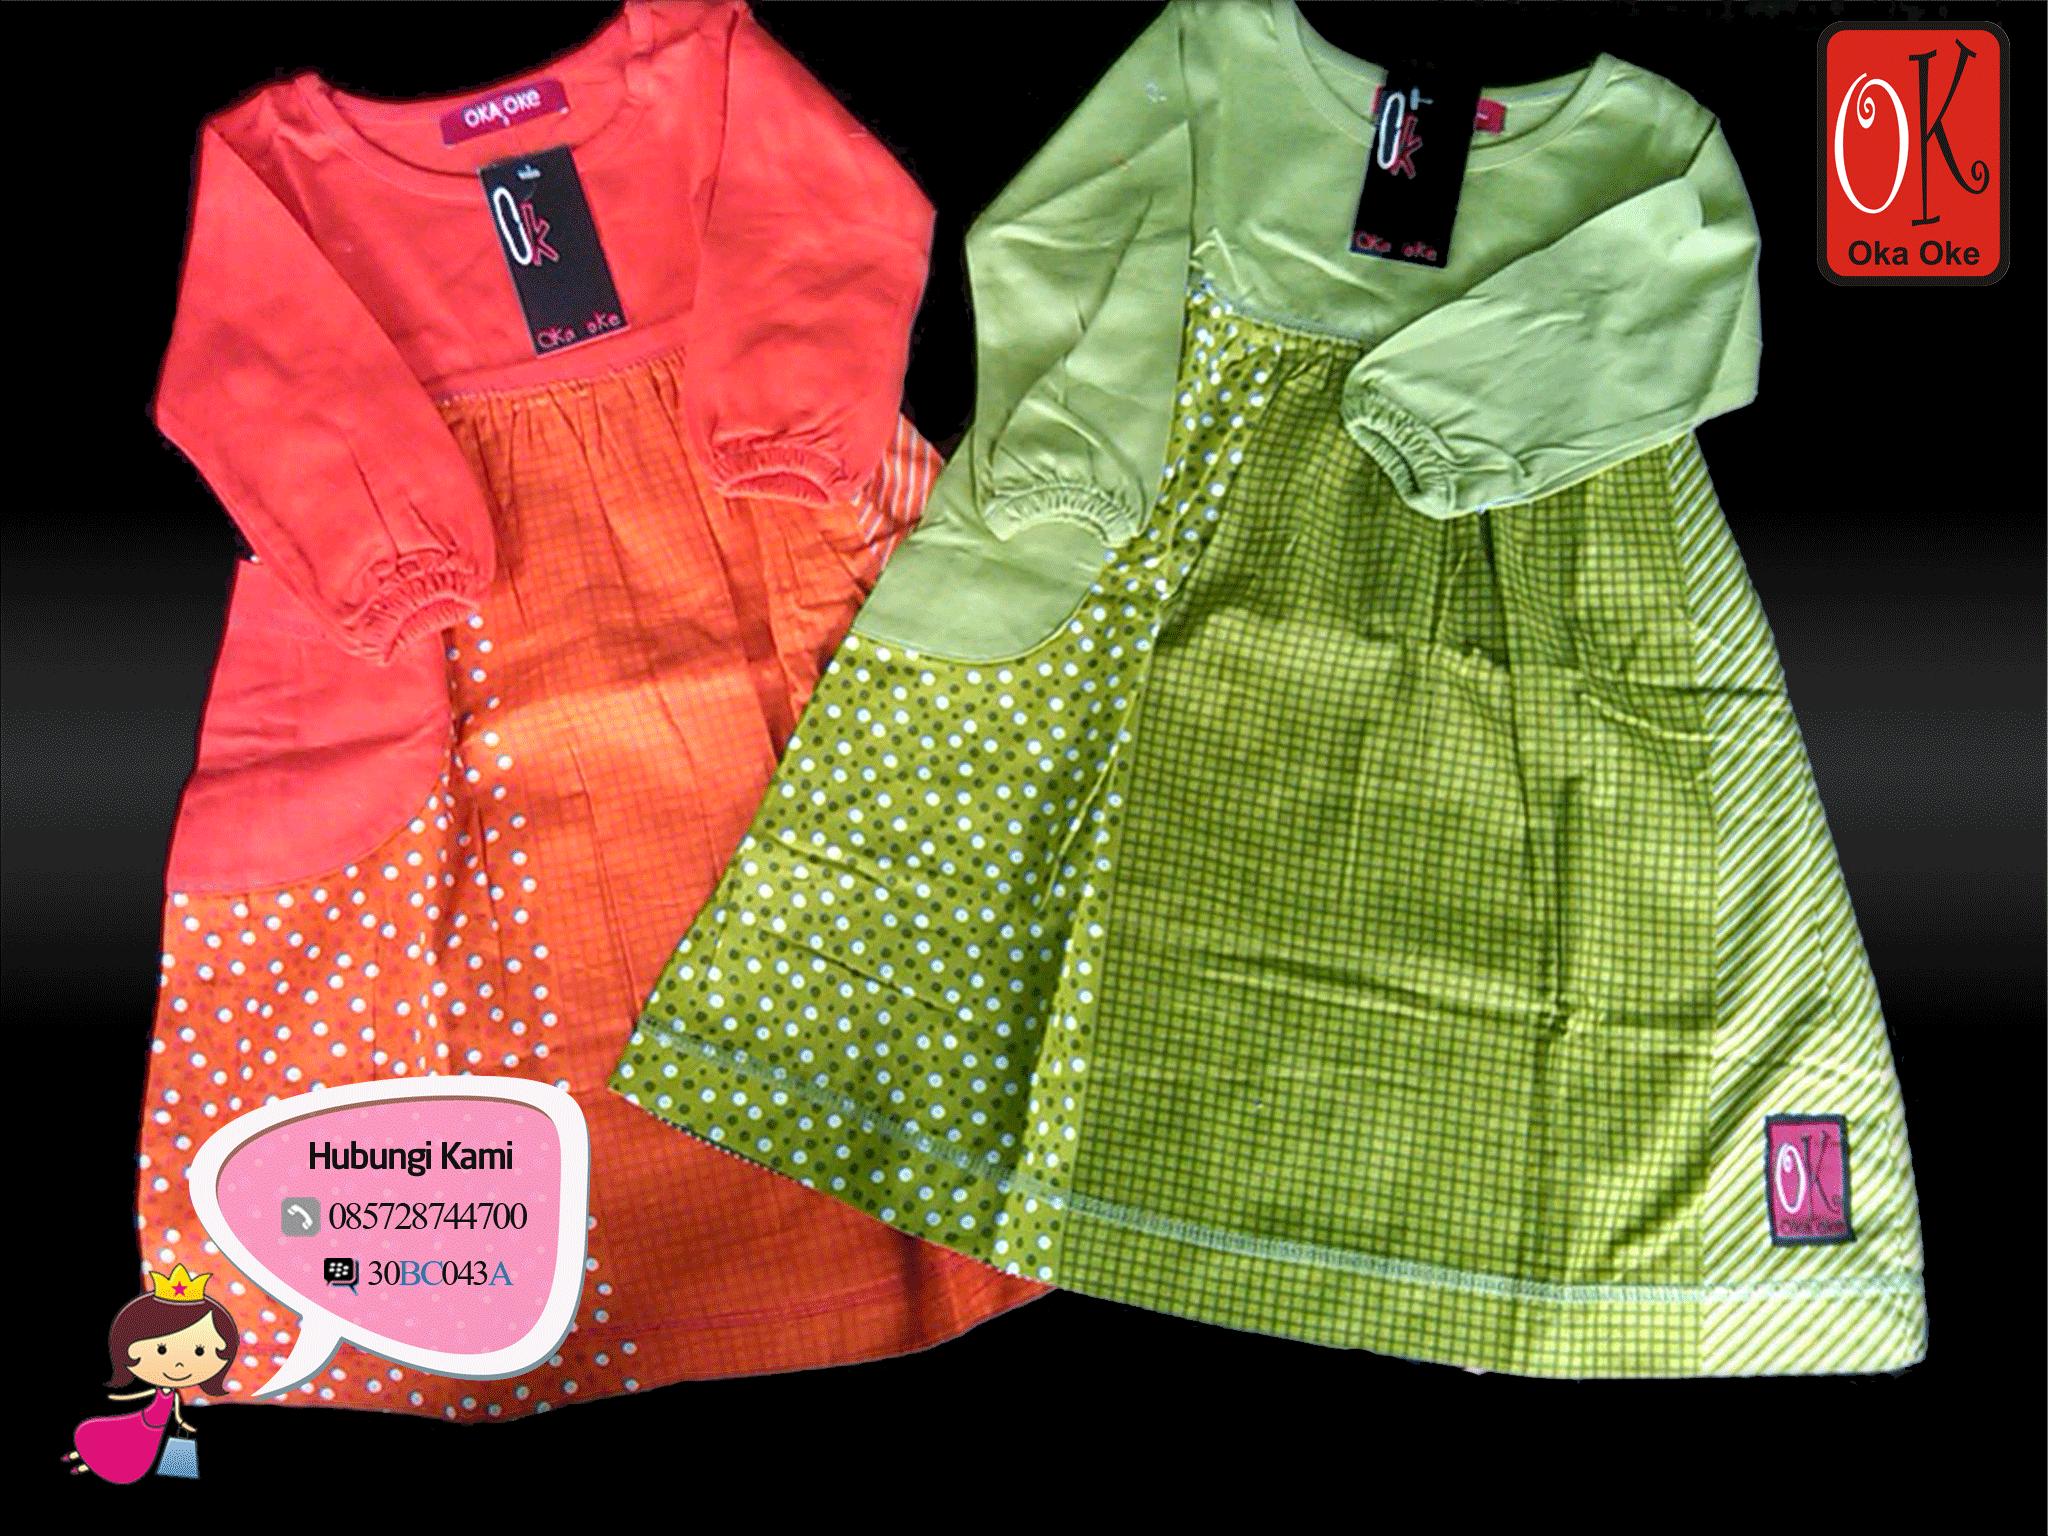 Pusat Grosir Baju Gamis Oka Oke Solo  Baju Gamis Anak  Baju